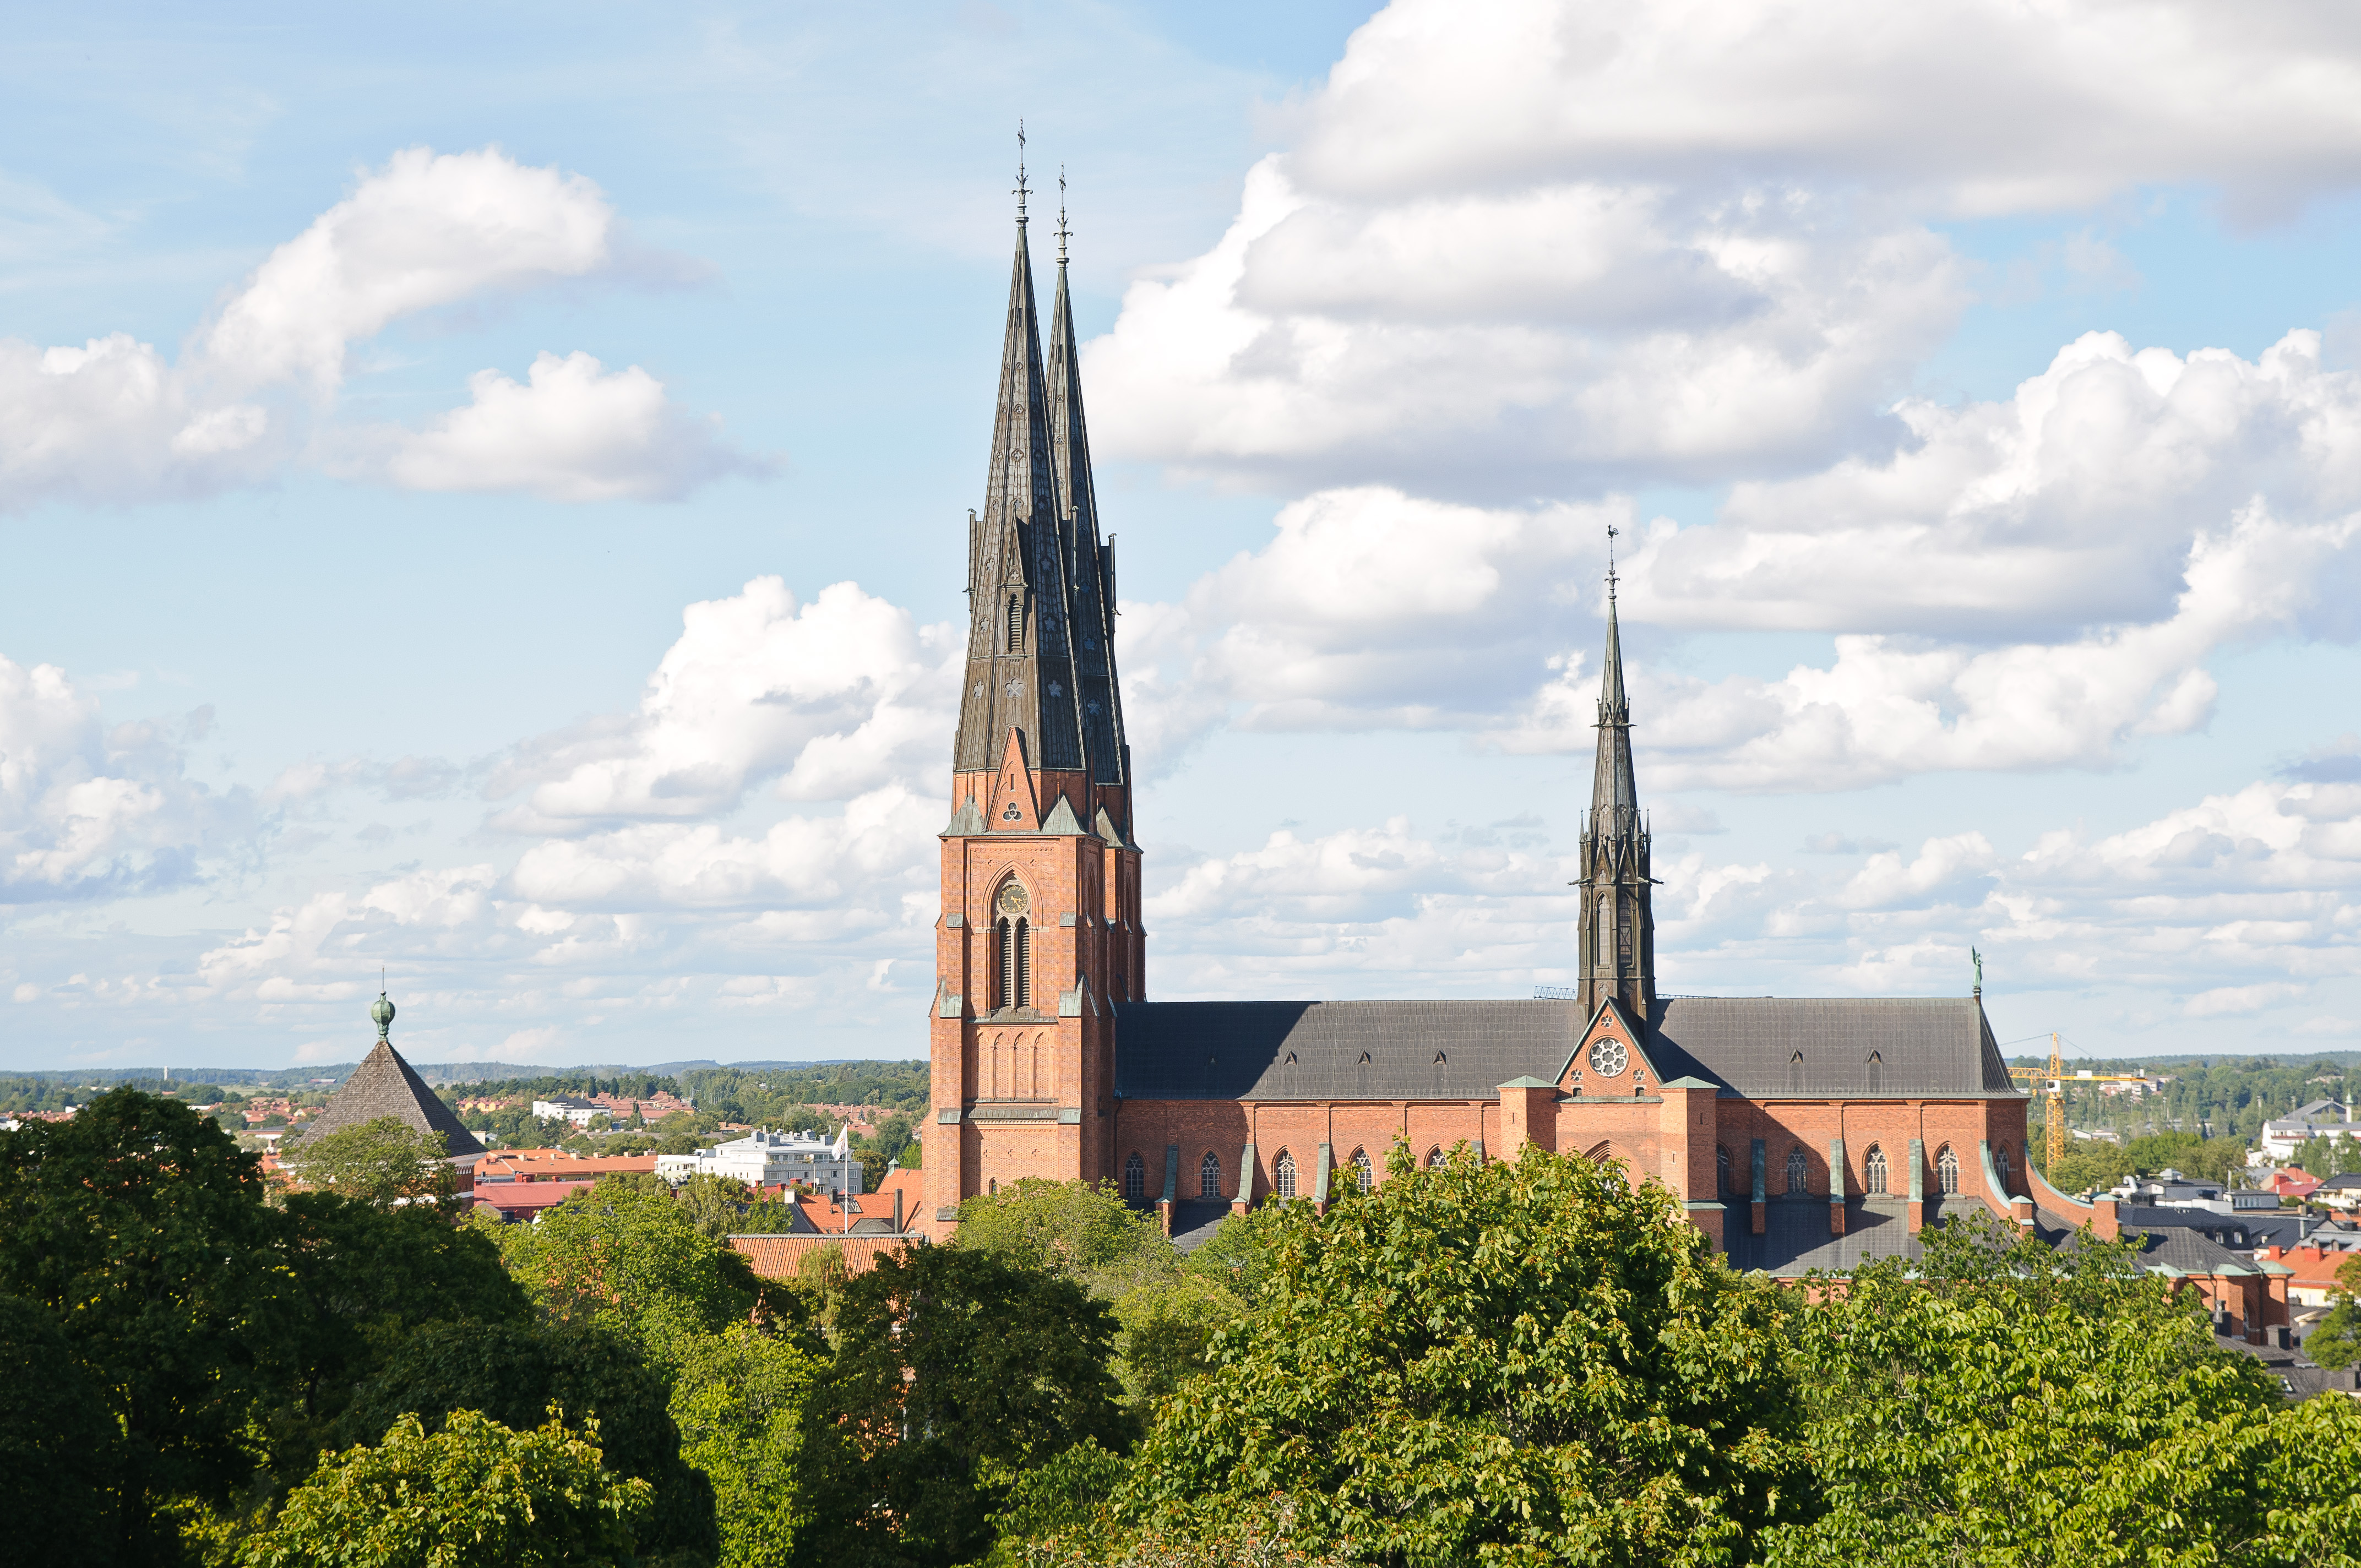 File:Uppsala Domkyrka.jpg - Wikimedia Commons